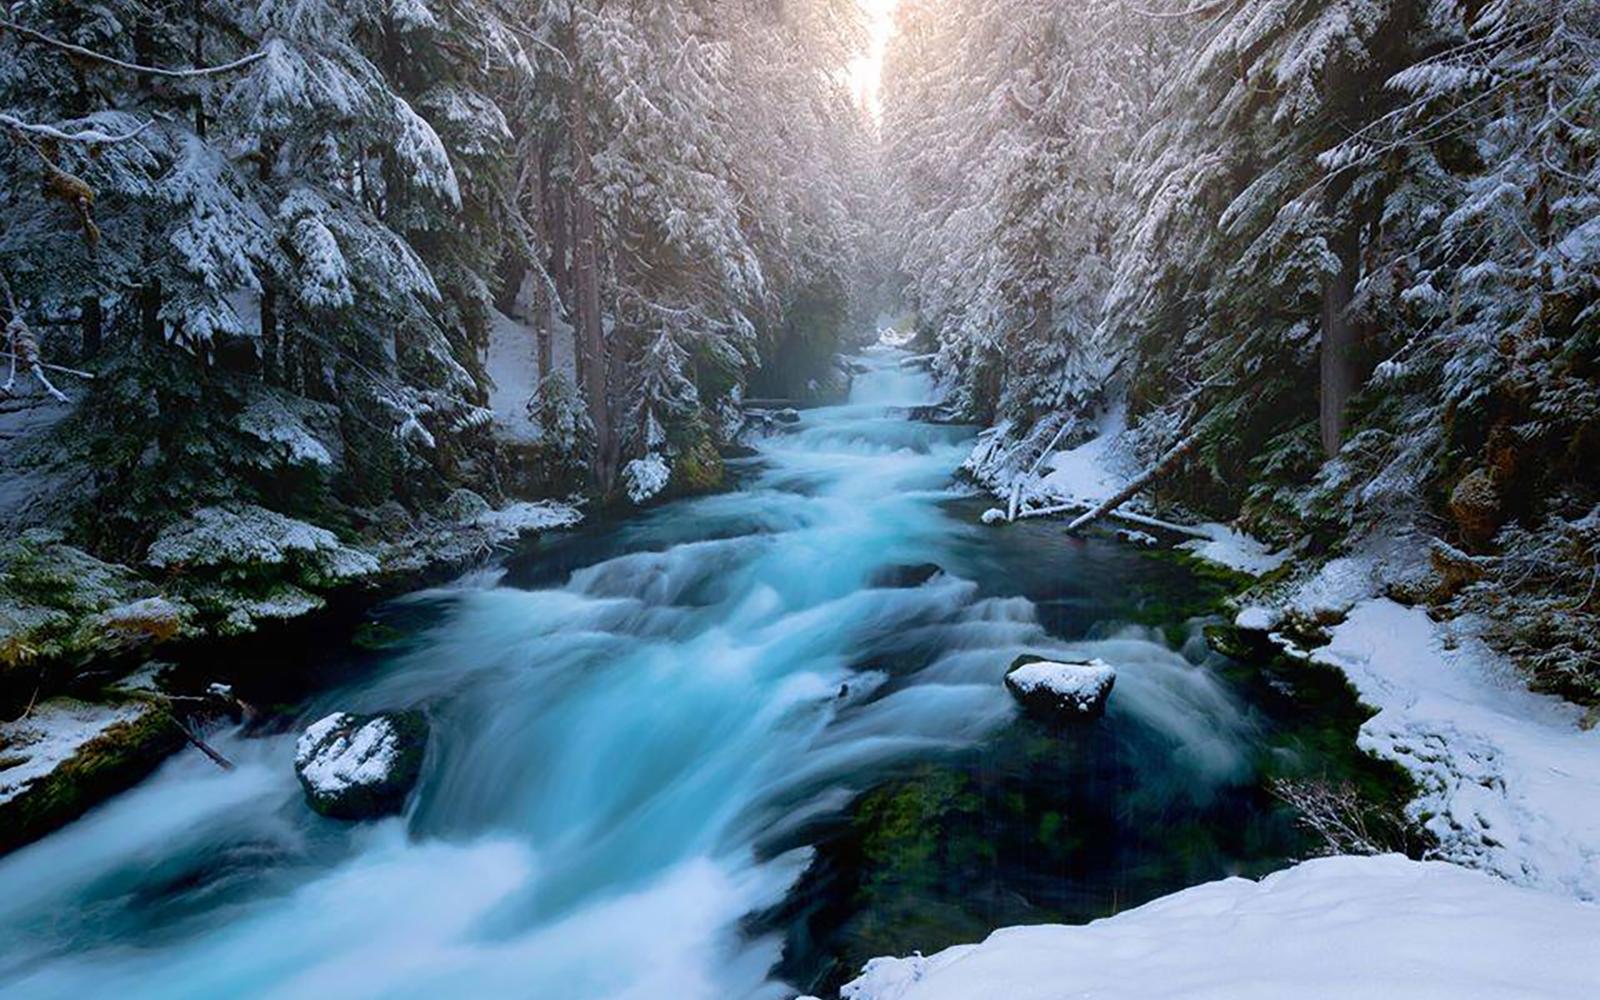 Wild and Scenic River Legislation Introduced